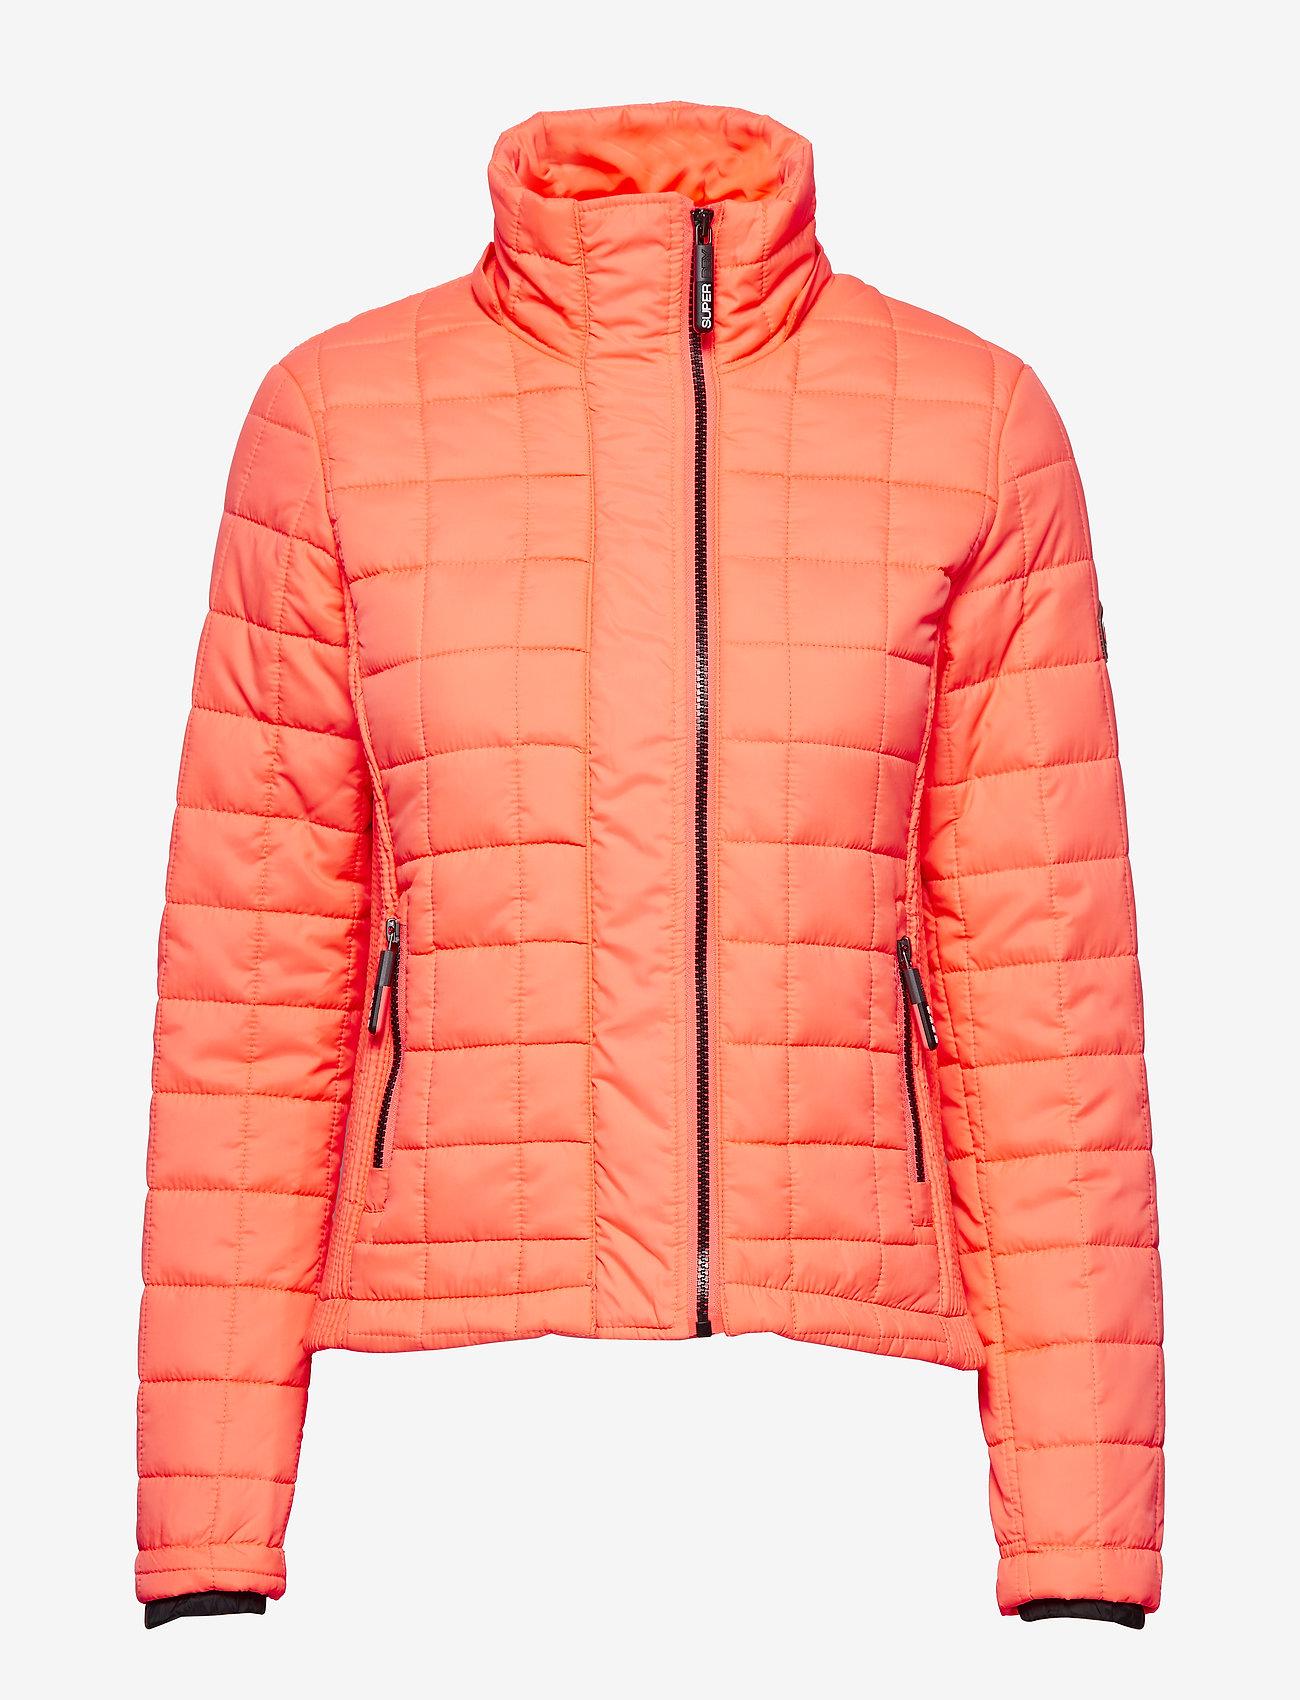 Hooded Box Quilt Fuji Jacket (Acid Coral) (64.98 €) - Superdry VLuCB